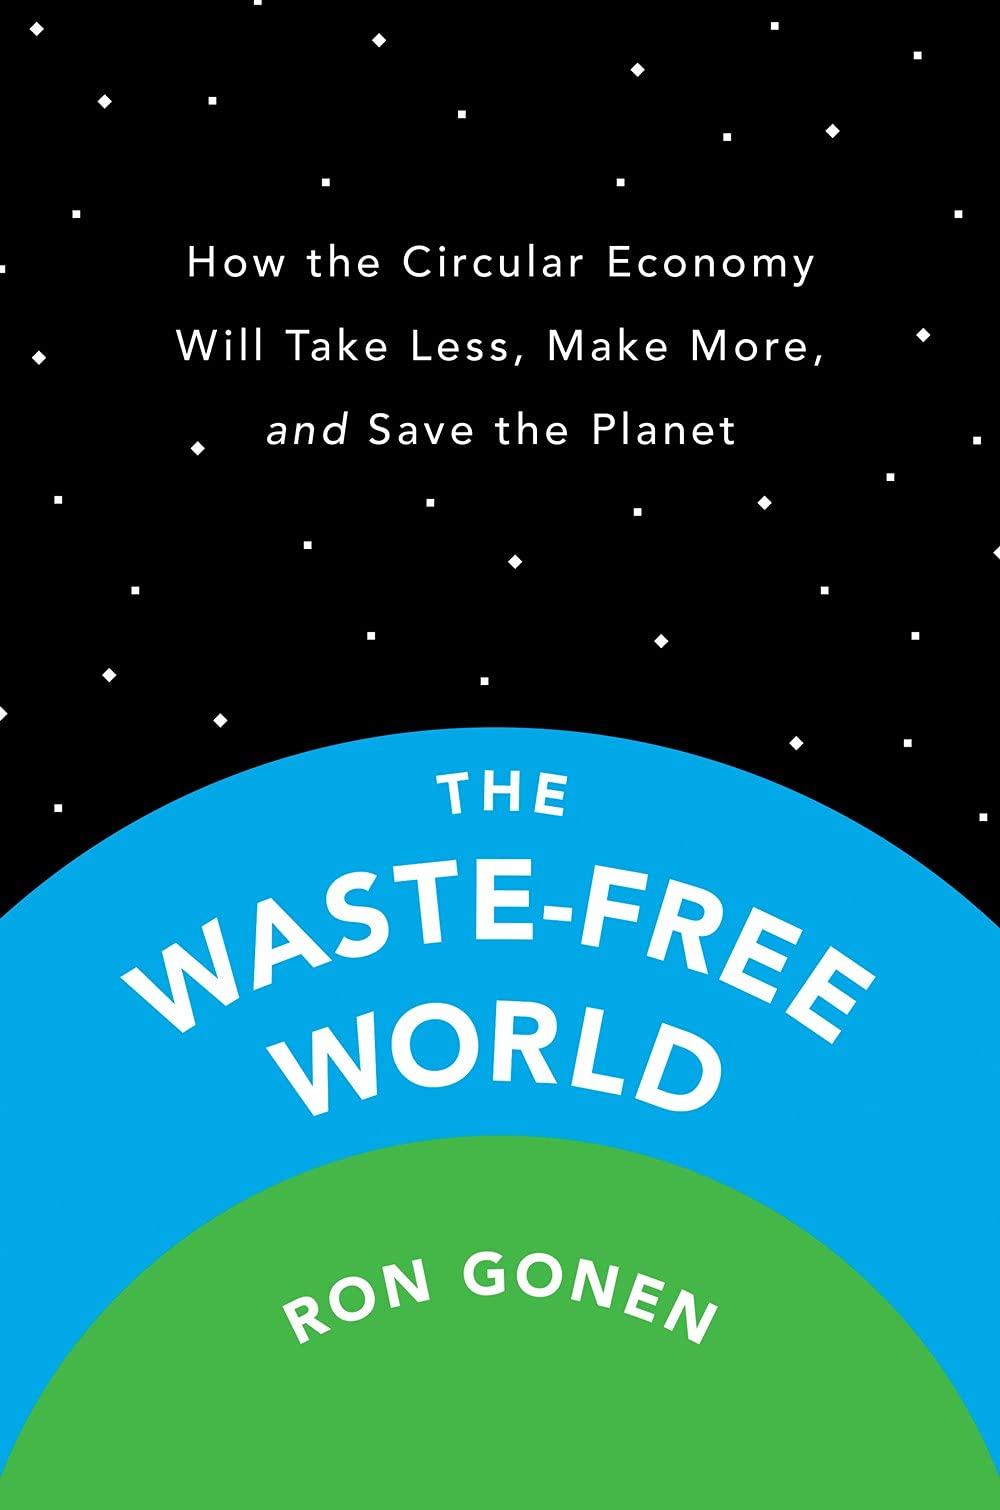 Ron Gonen The Waste Free World.